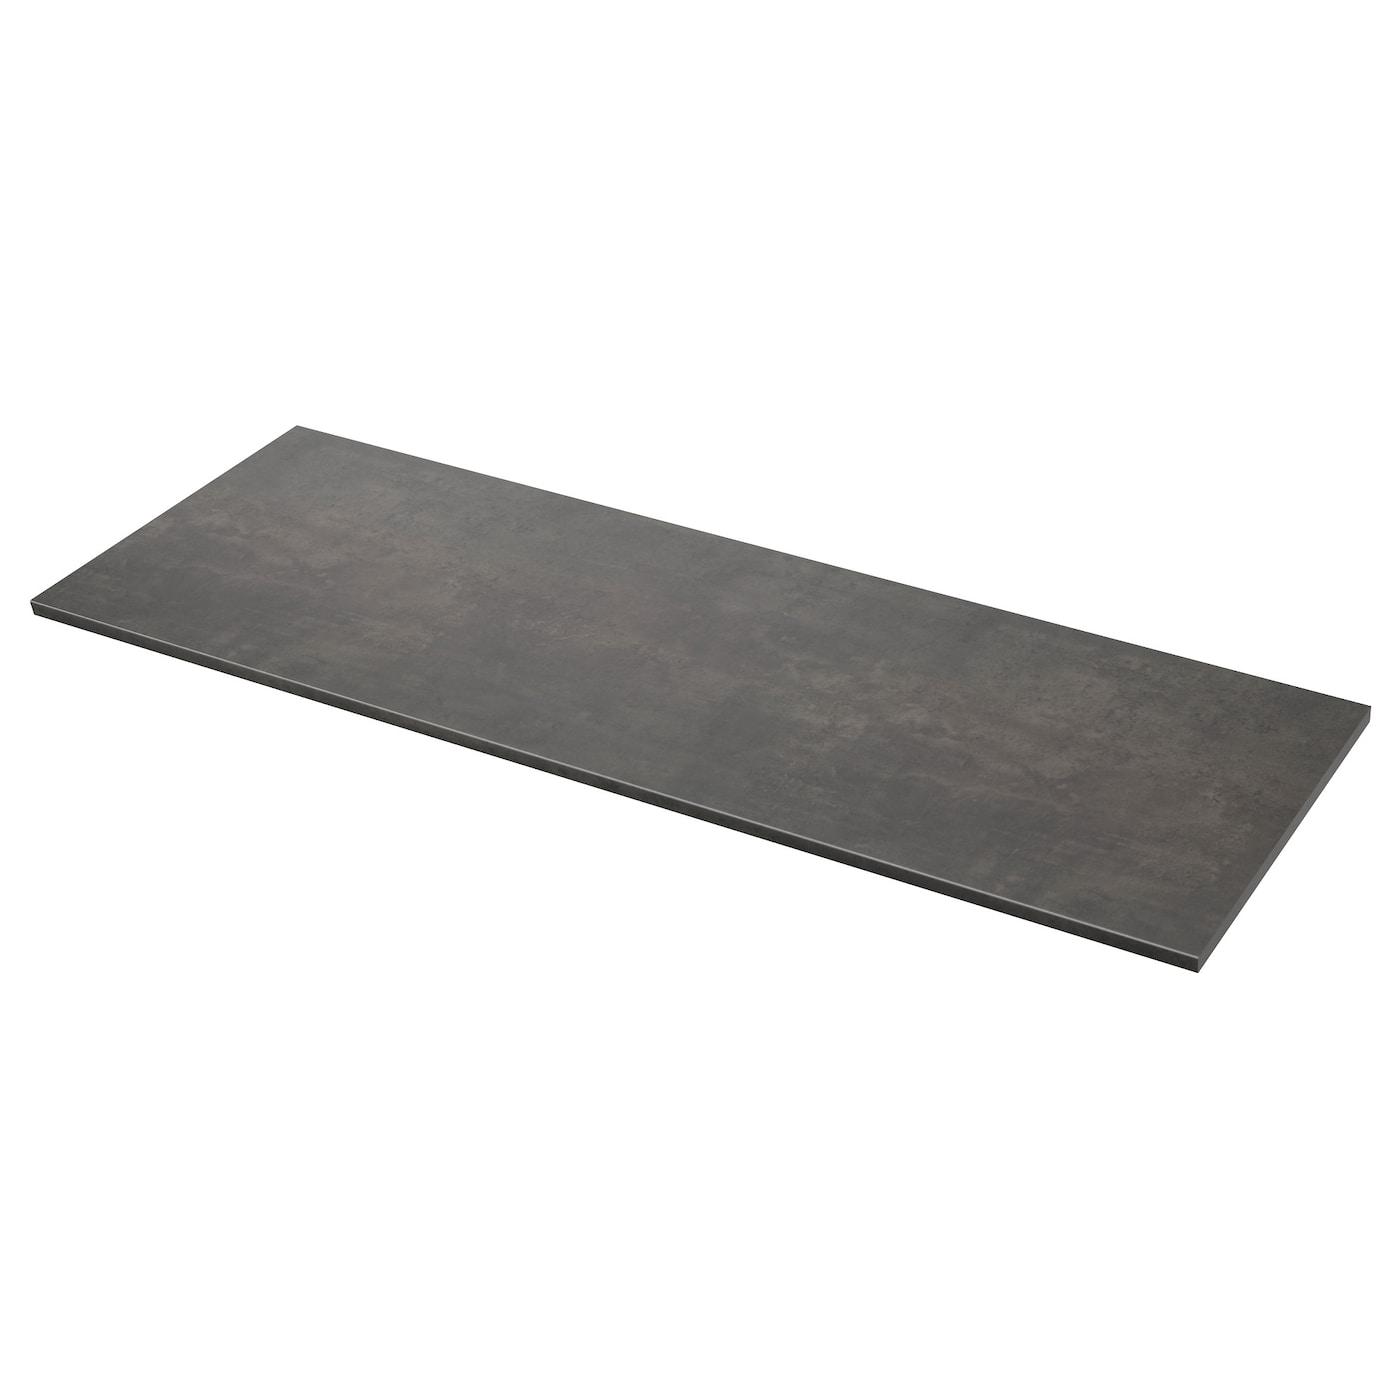 186x3,8cm Ikea möllekulla travail plaque de chêne; plaque de cuisine